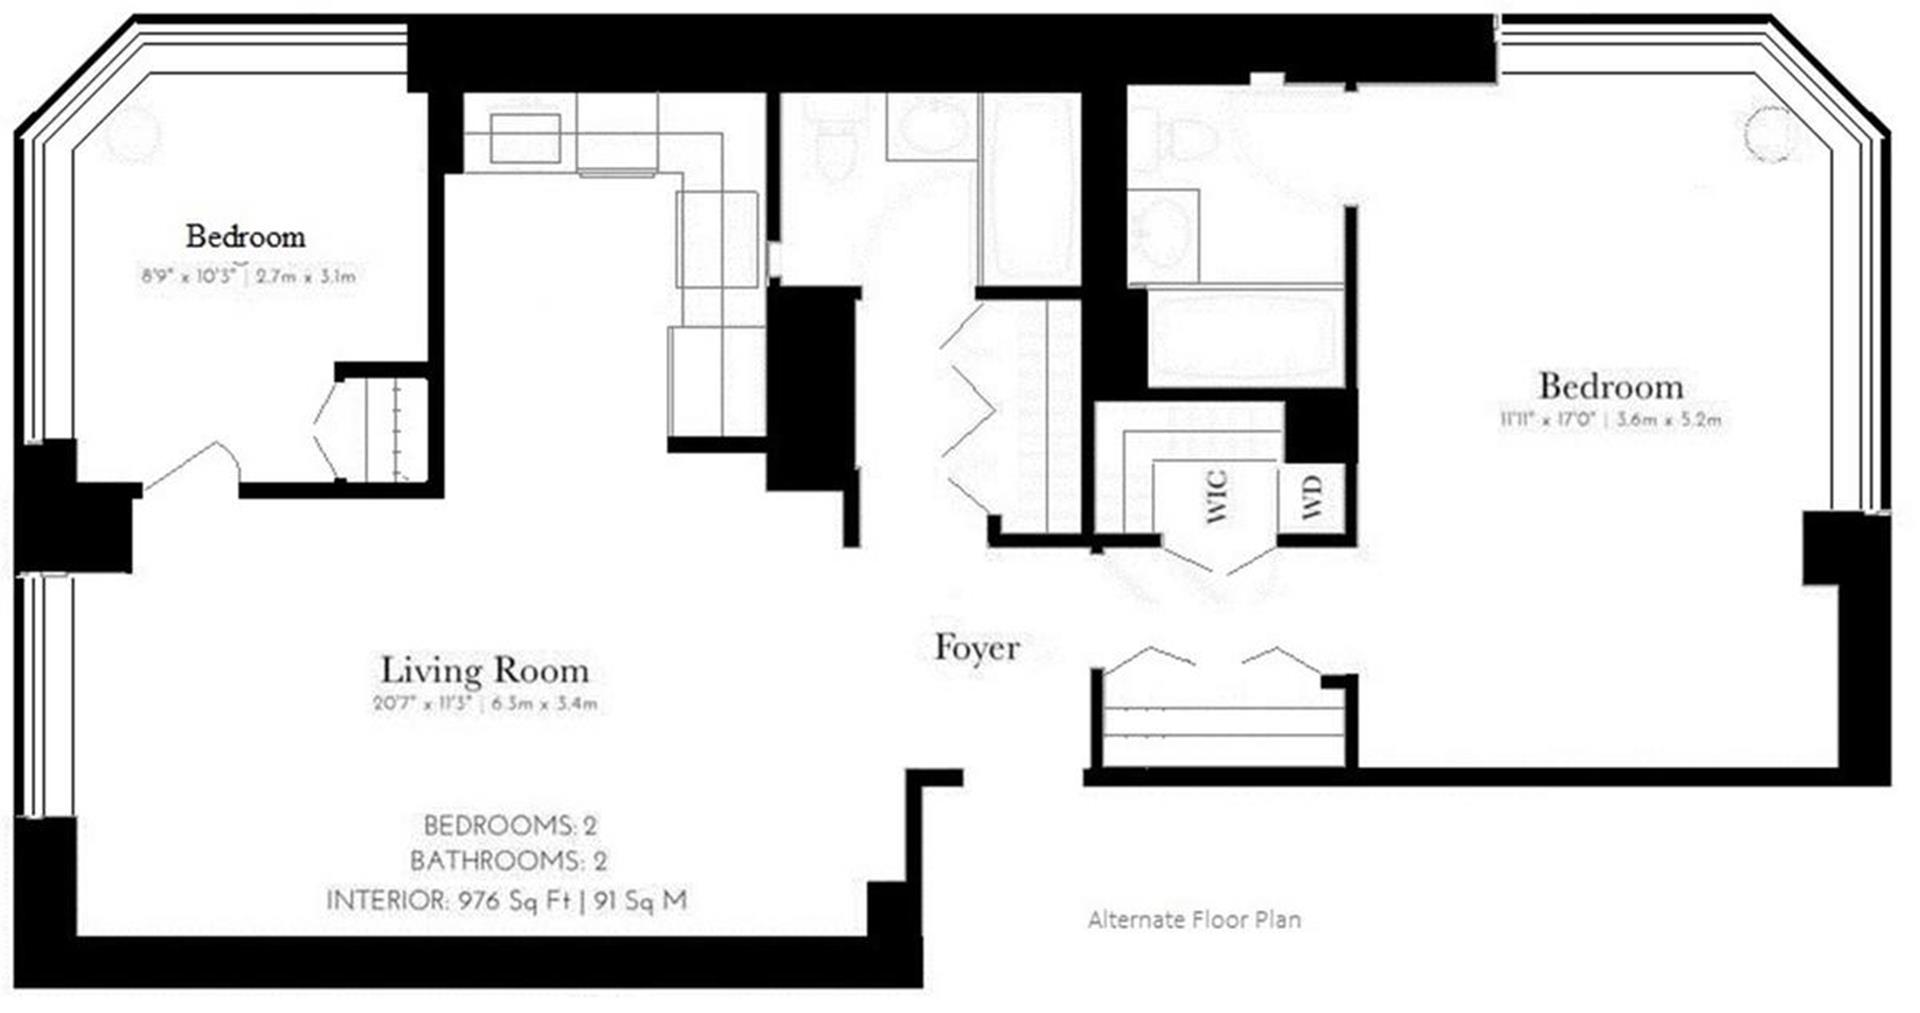 Floor plan of 300 East 64th Street, 23C - Upper East Side, New York